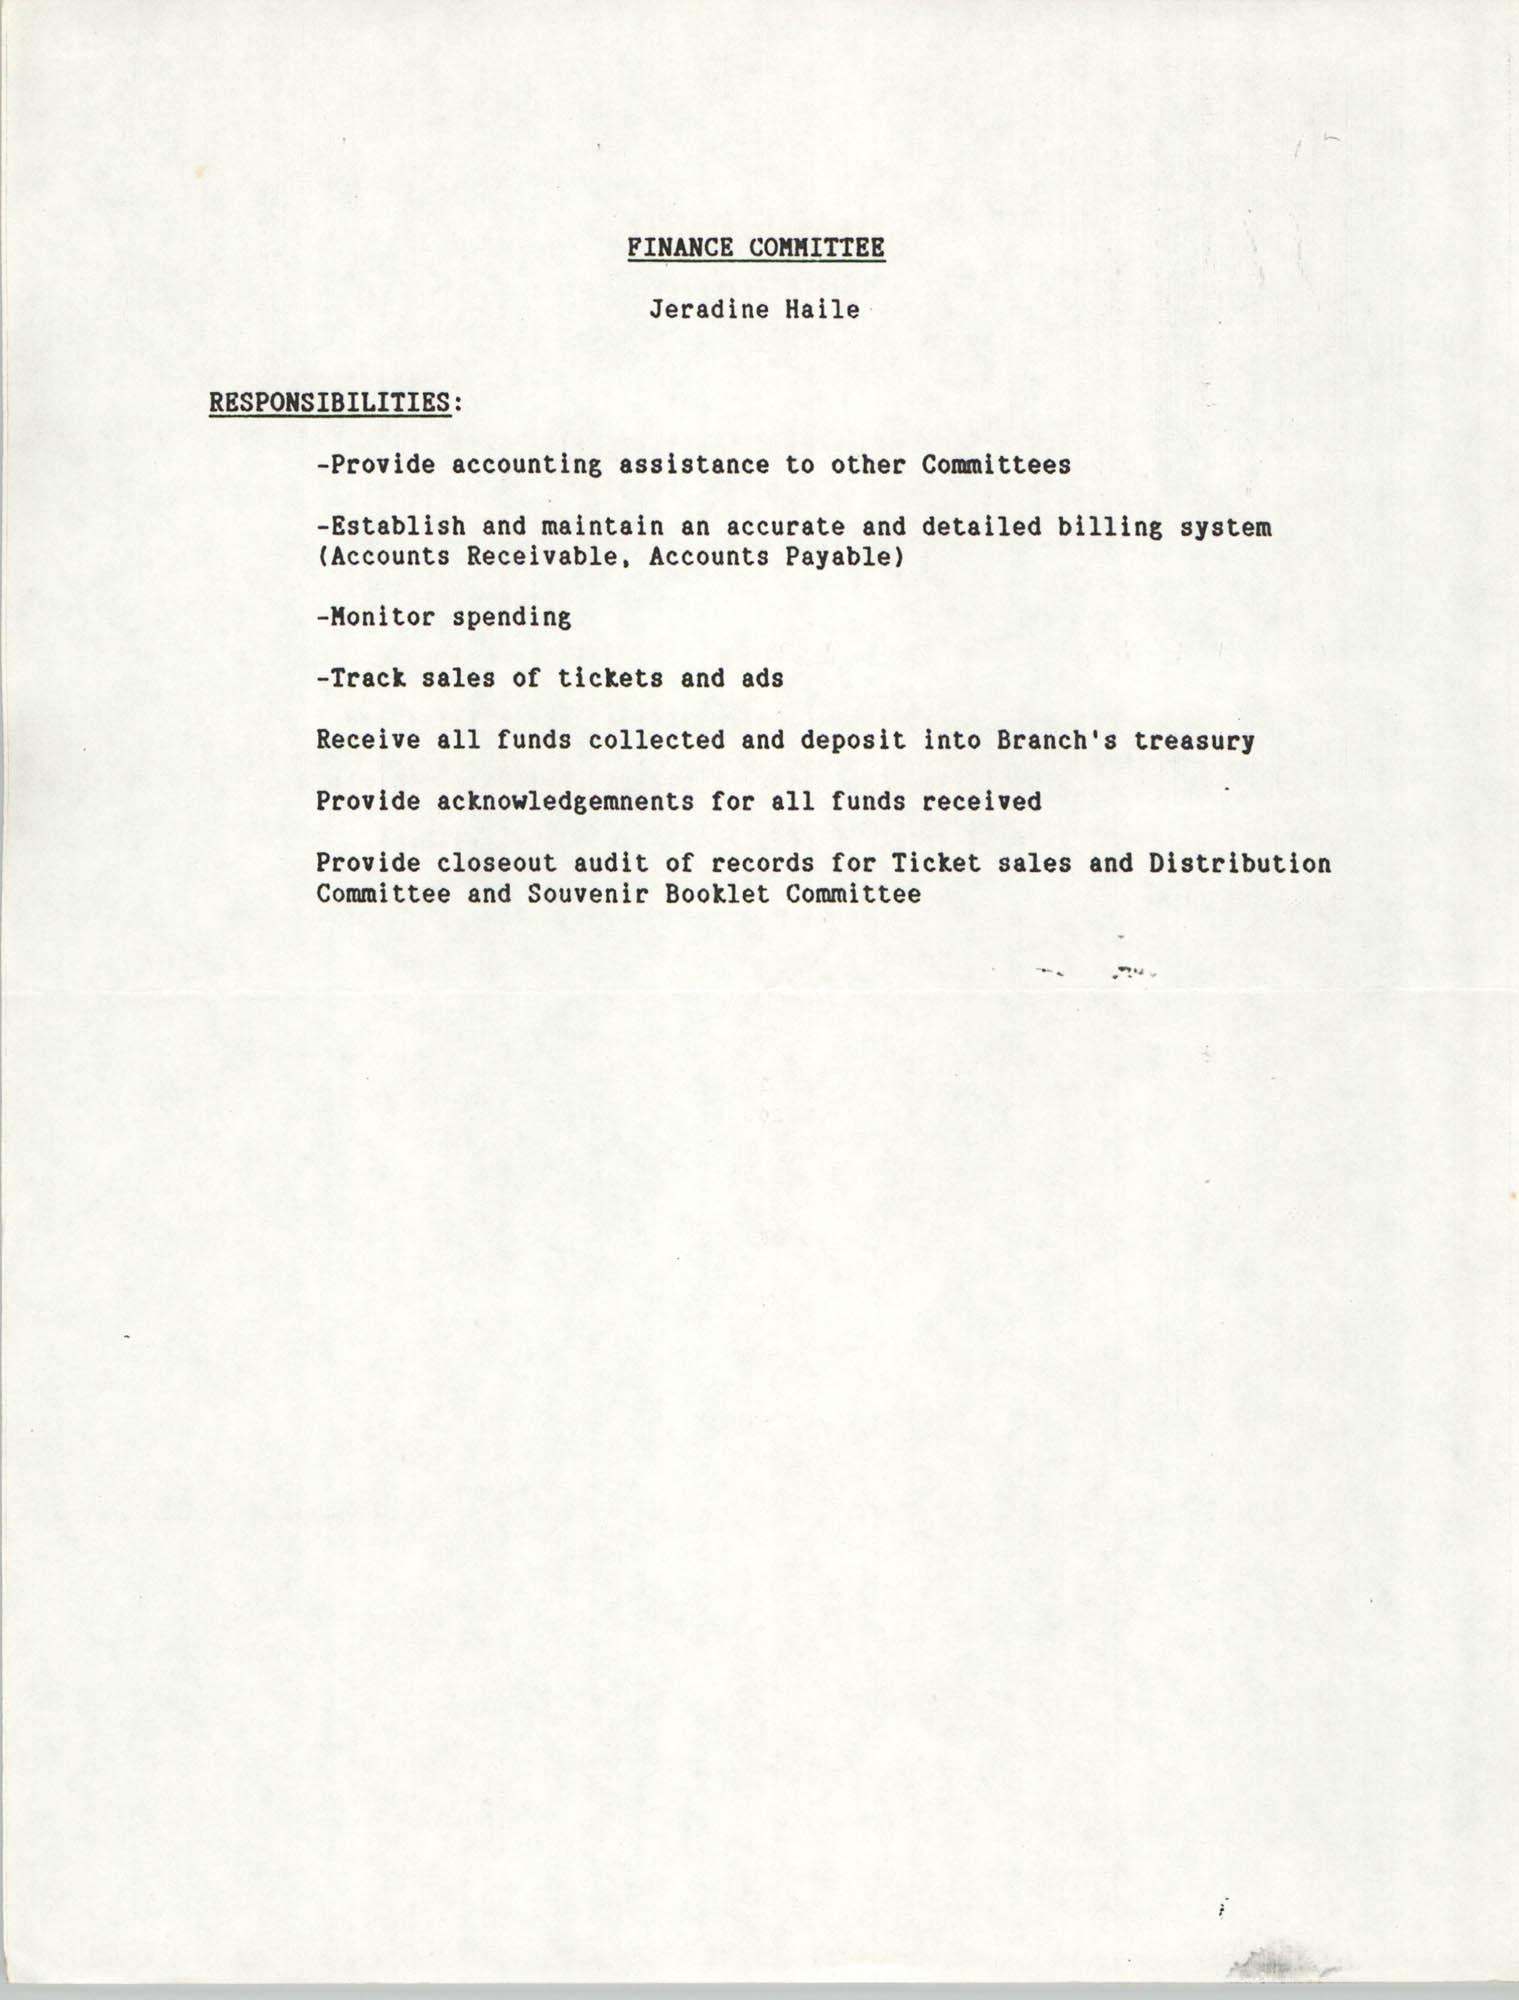 List of responsibilities, Finance Committee,  Jeradine Haile